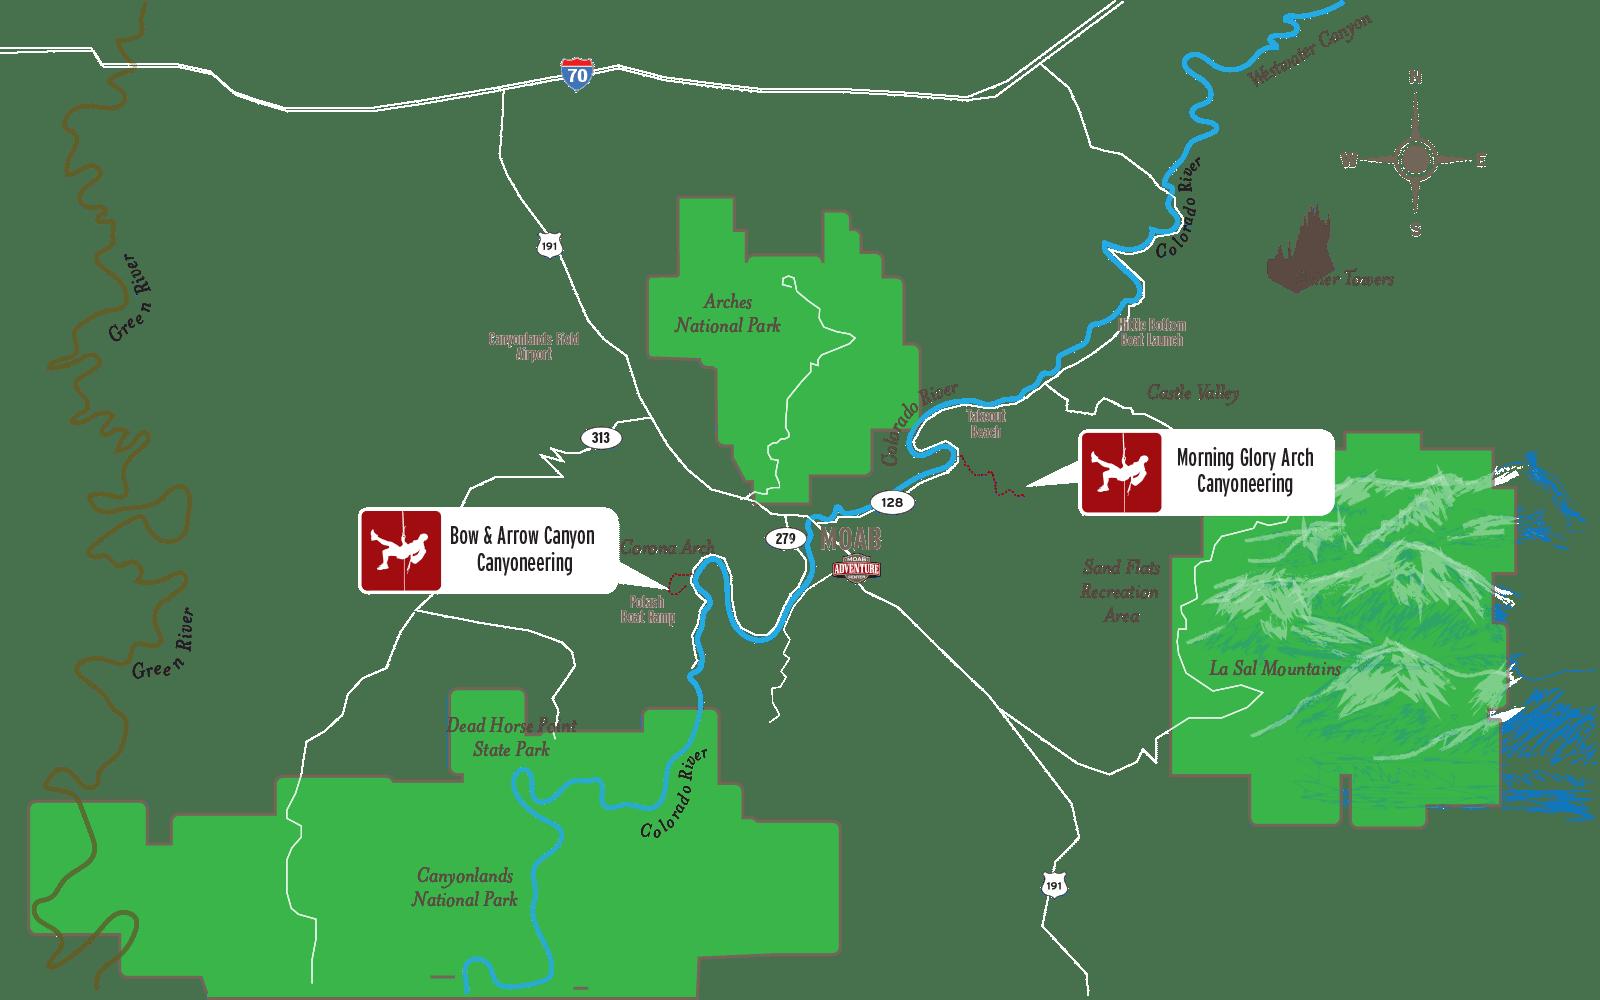 Canyoneering Moab map